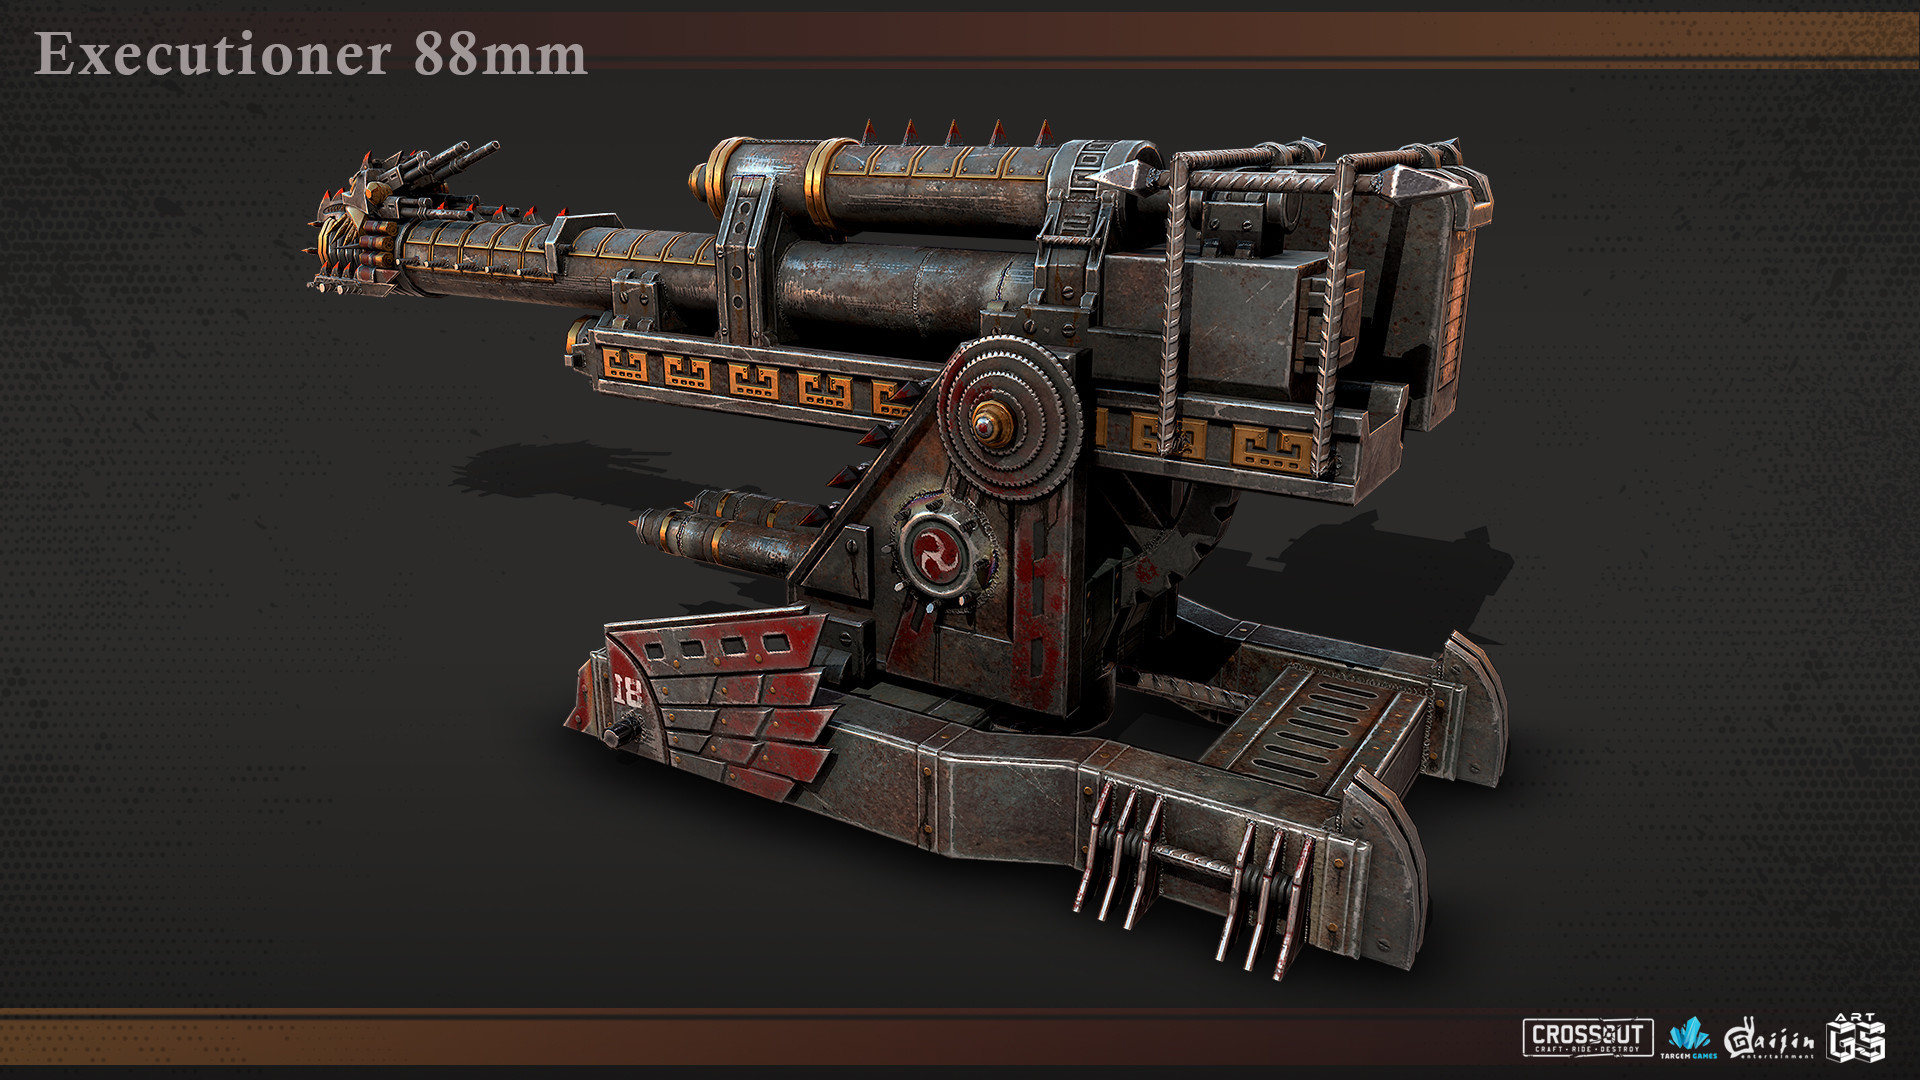 ArtStation - Crossout cannons, Ilya Samokoz